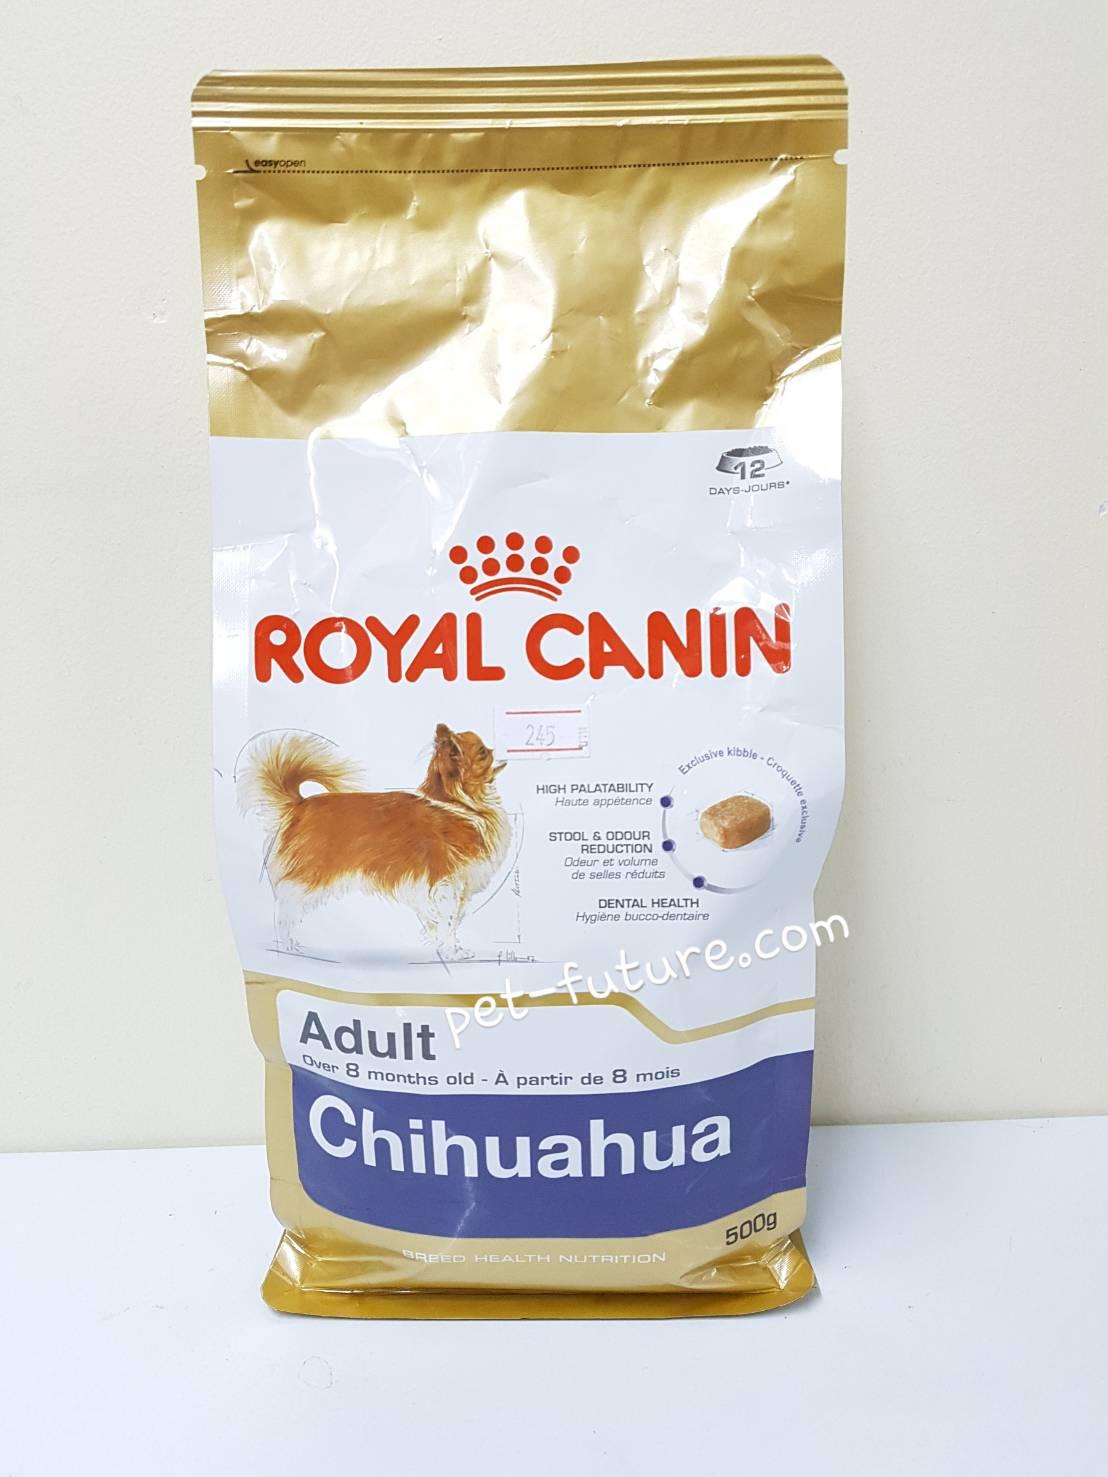 BHN Chihuahua junior 500 g. ลูกสุนัขสายพันธ์ชิวาวา Exp.6/18